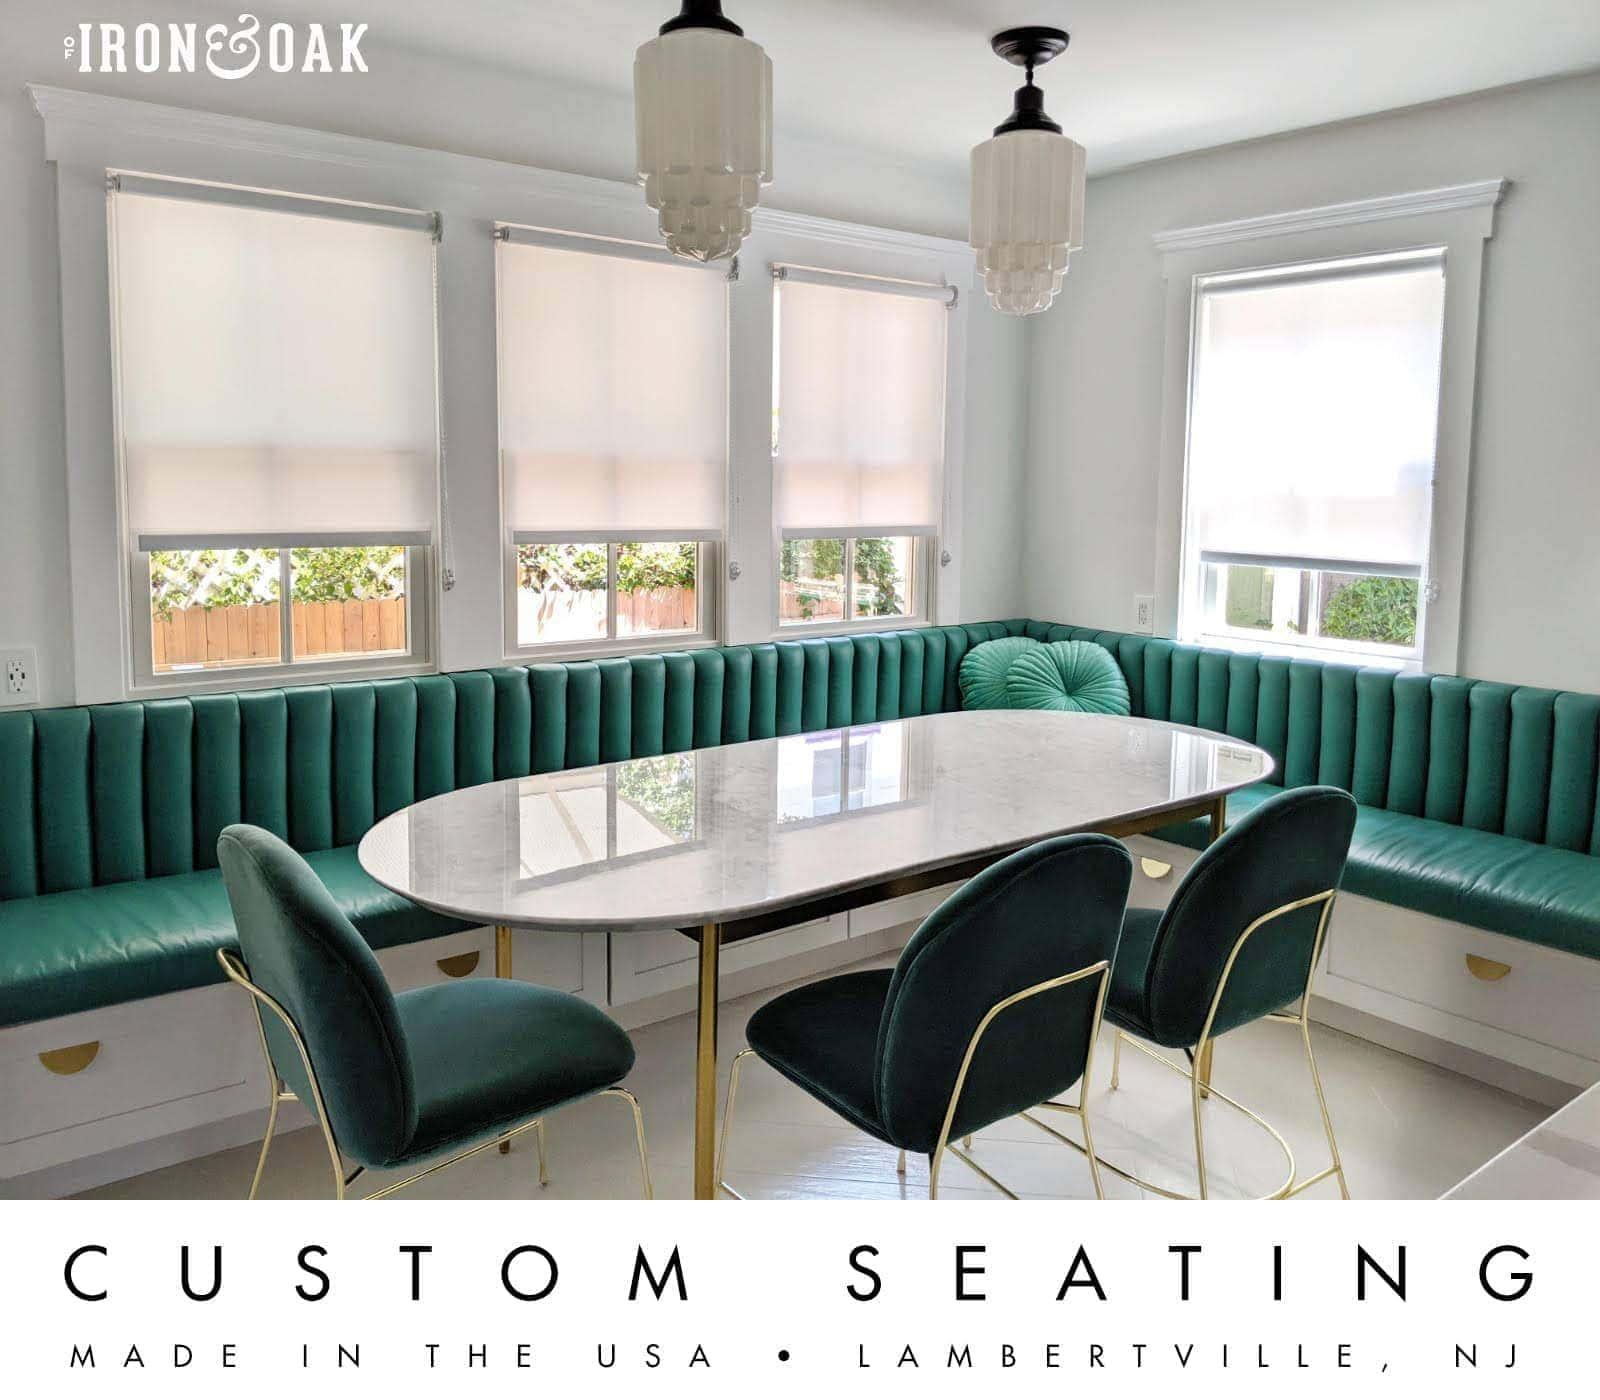 of Iron & Oak Custom Seating Kitchen